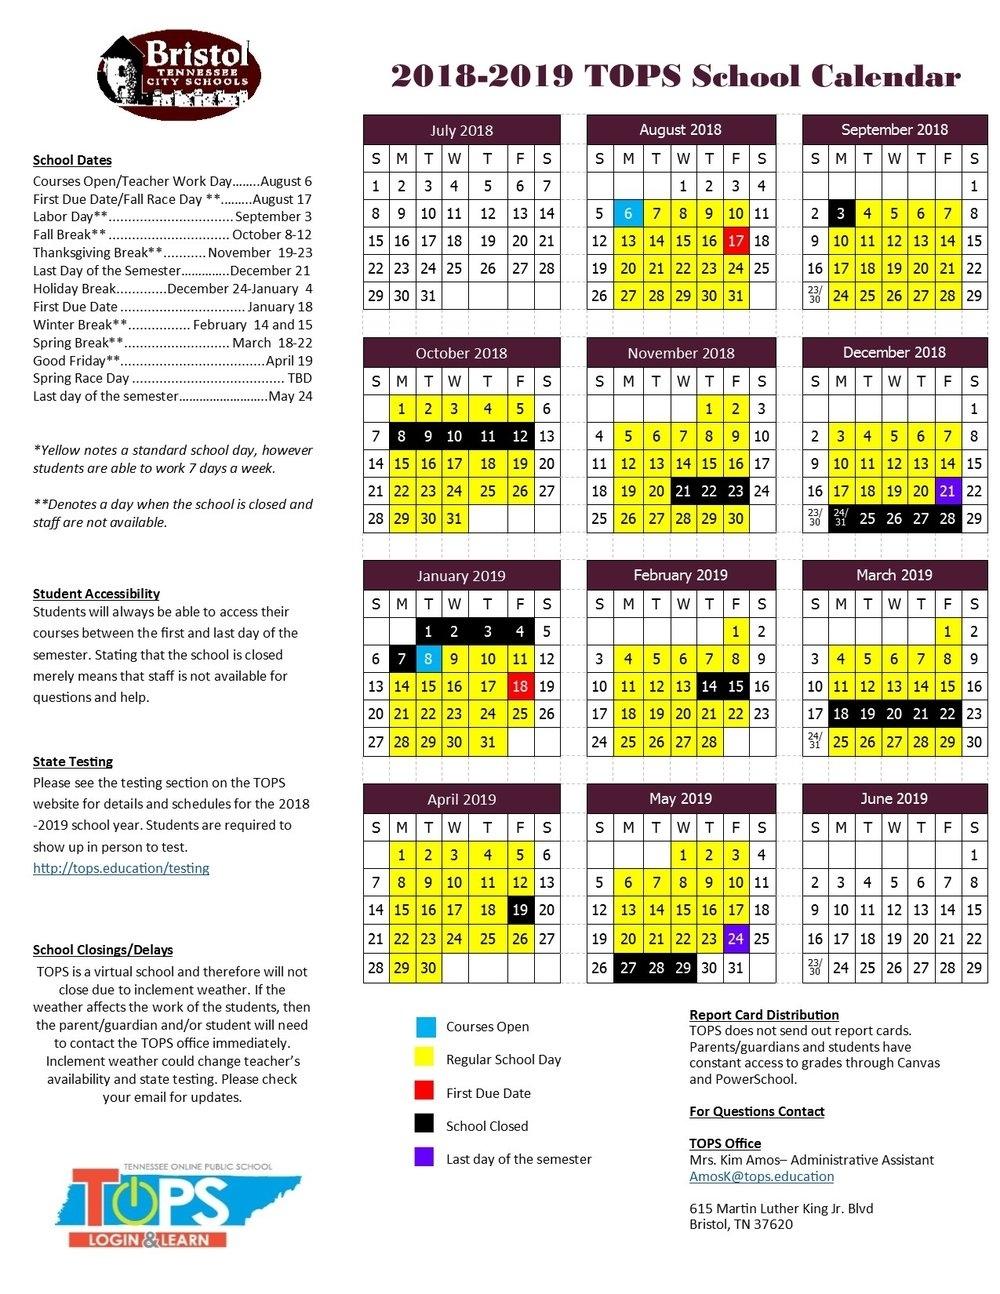 School Calendar — Tennessee Online Public School Exceptional 9 Week School Calendar